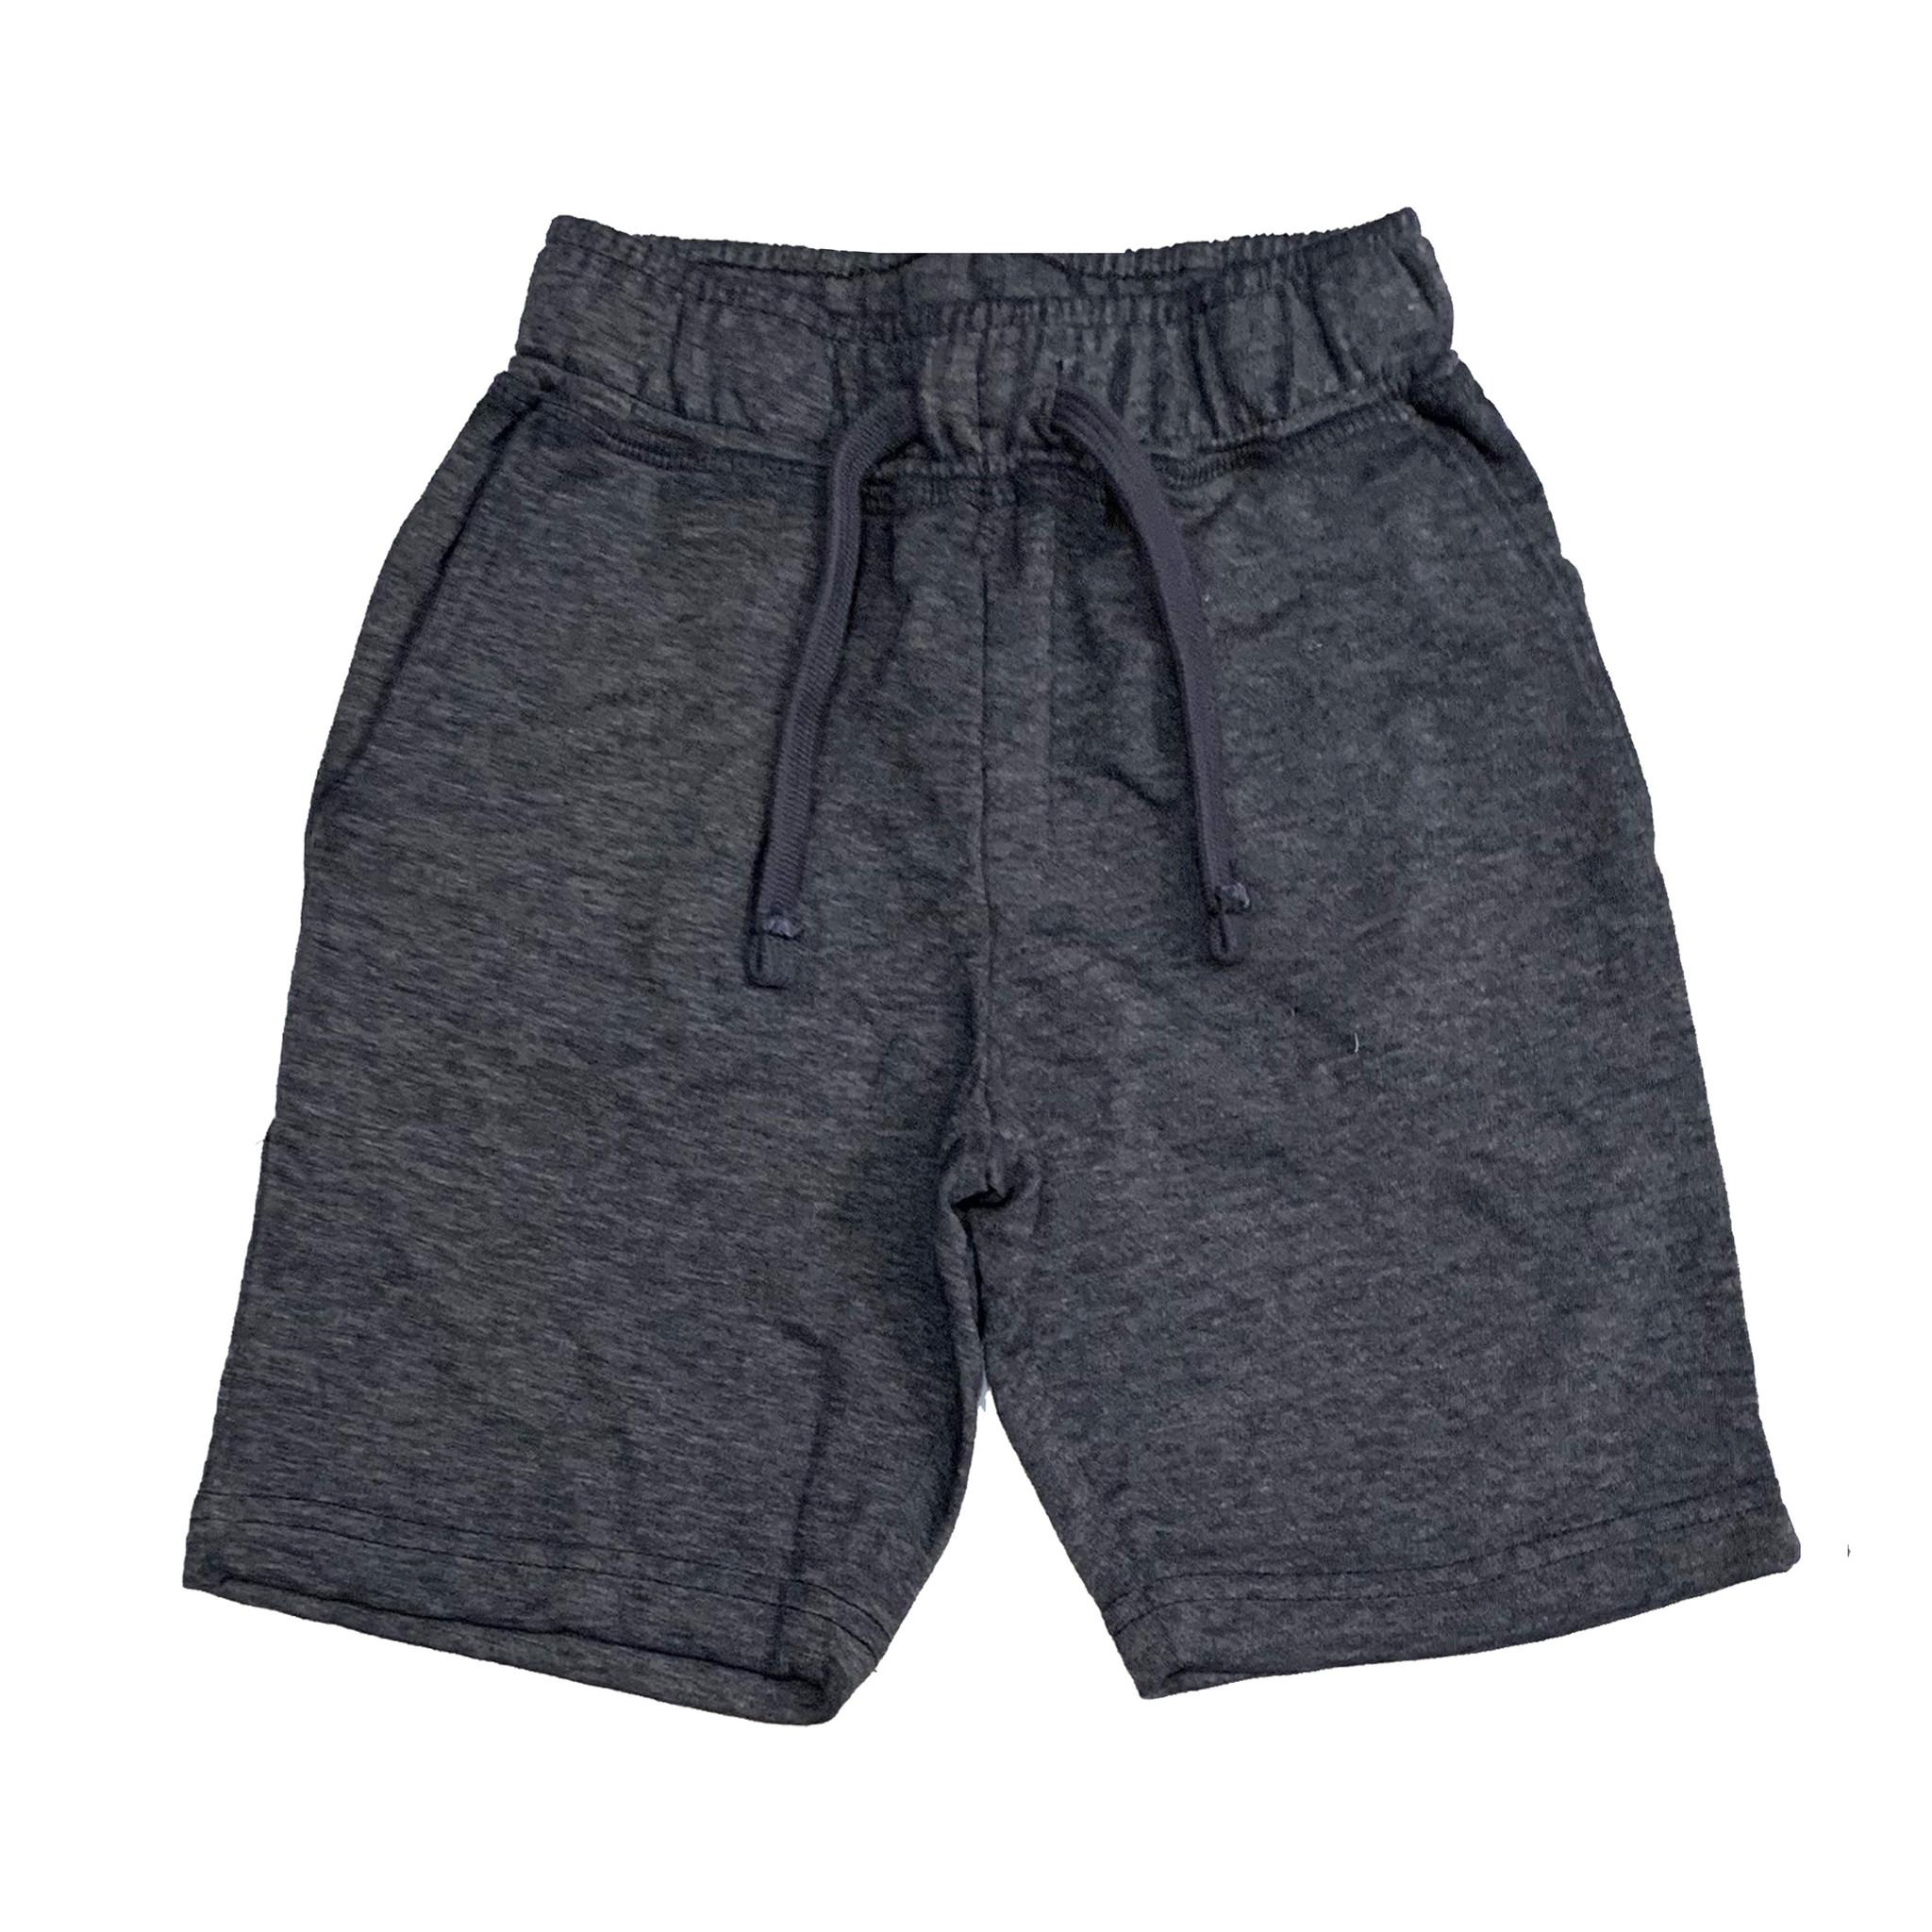 Mish Distressed Navy Basic Short